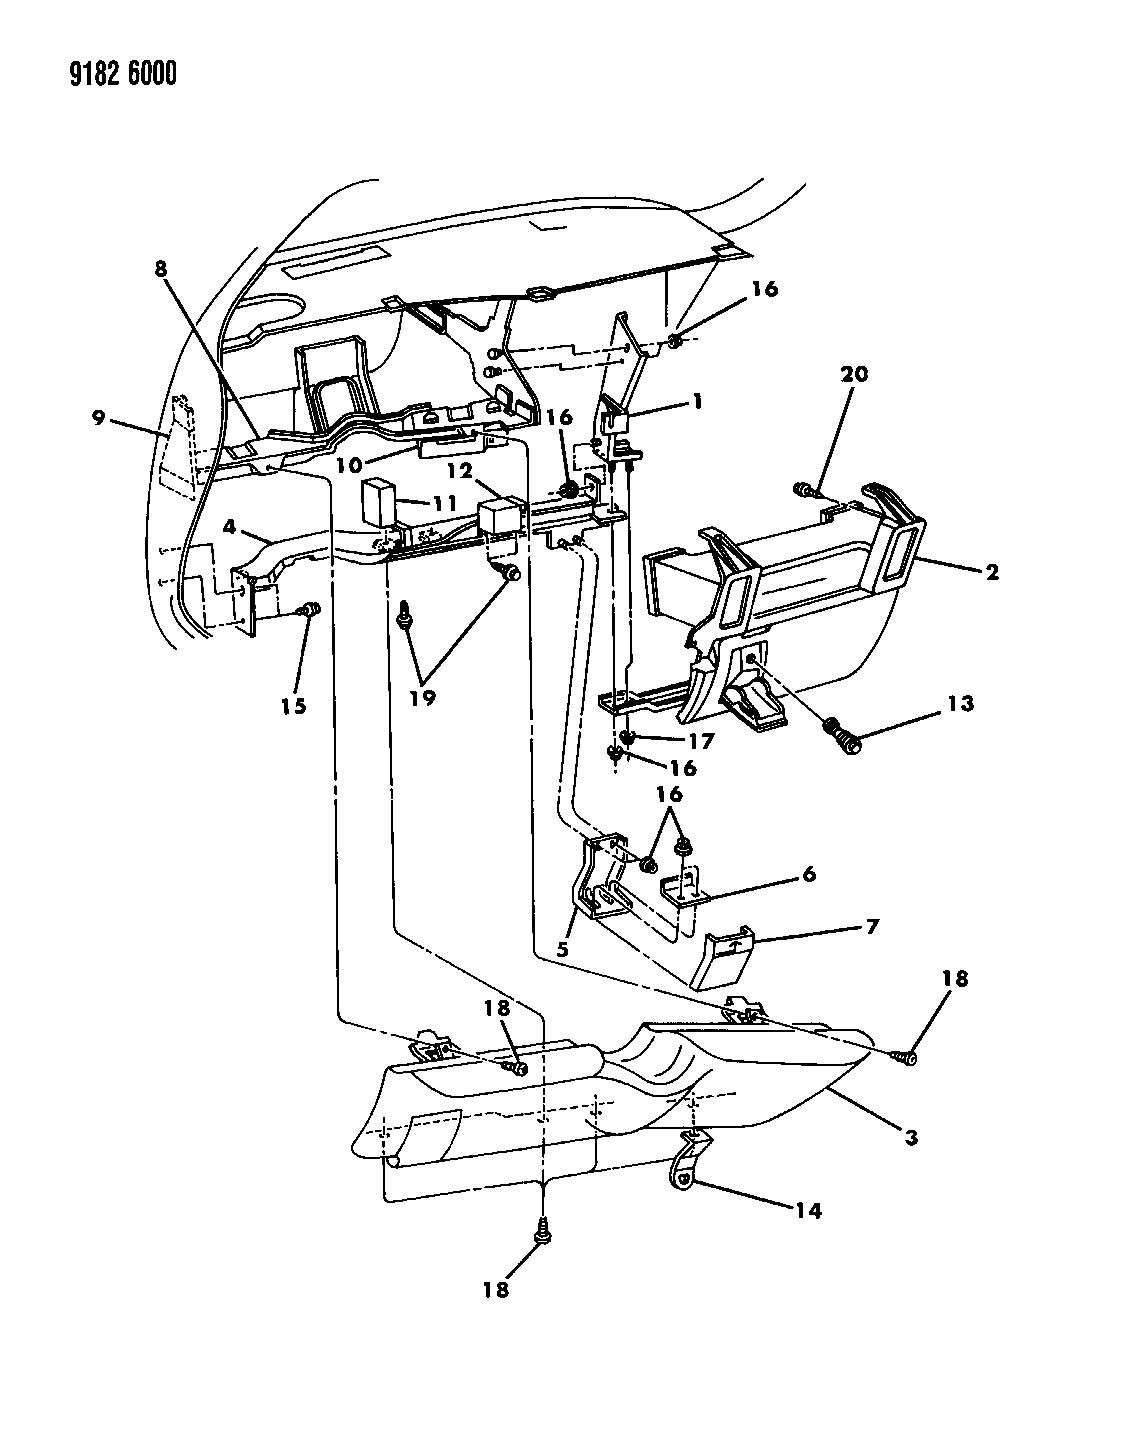 00000YEW  Dodge Grand Caravan Wiring Diagram on rear suspension, radiator system, sliding door parts, body parts, stereo wiring, brake repair, radio wiring, fuel tank, serpentine belt,